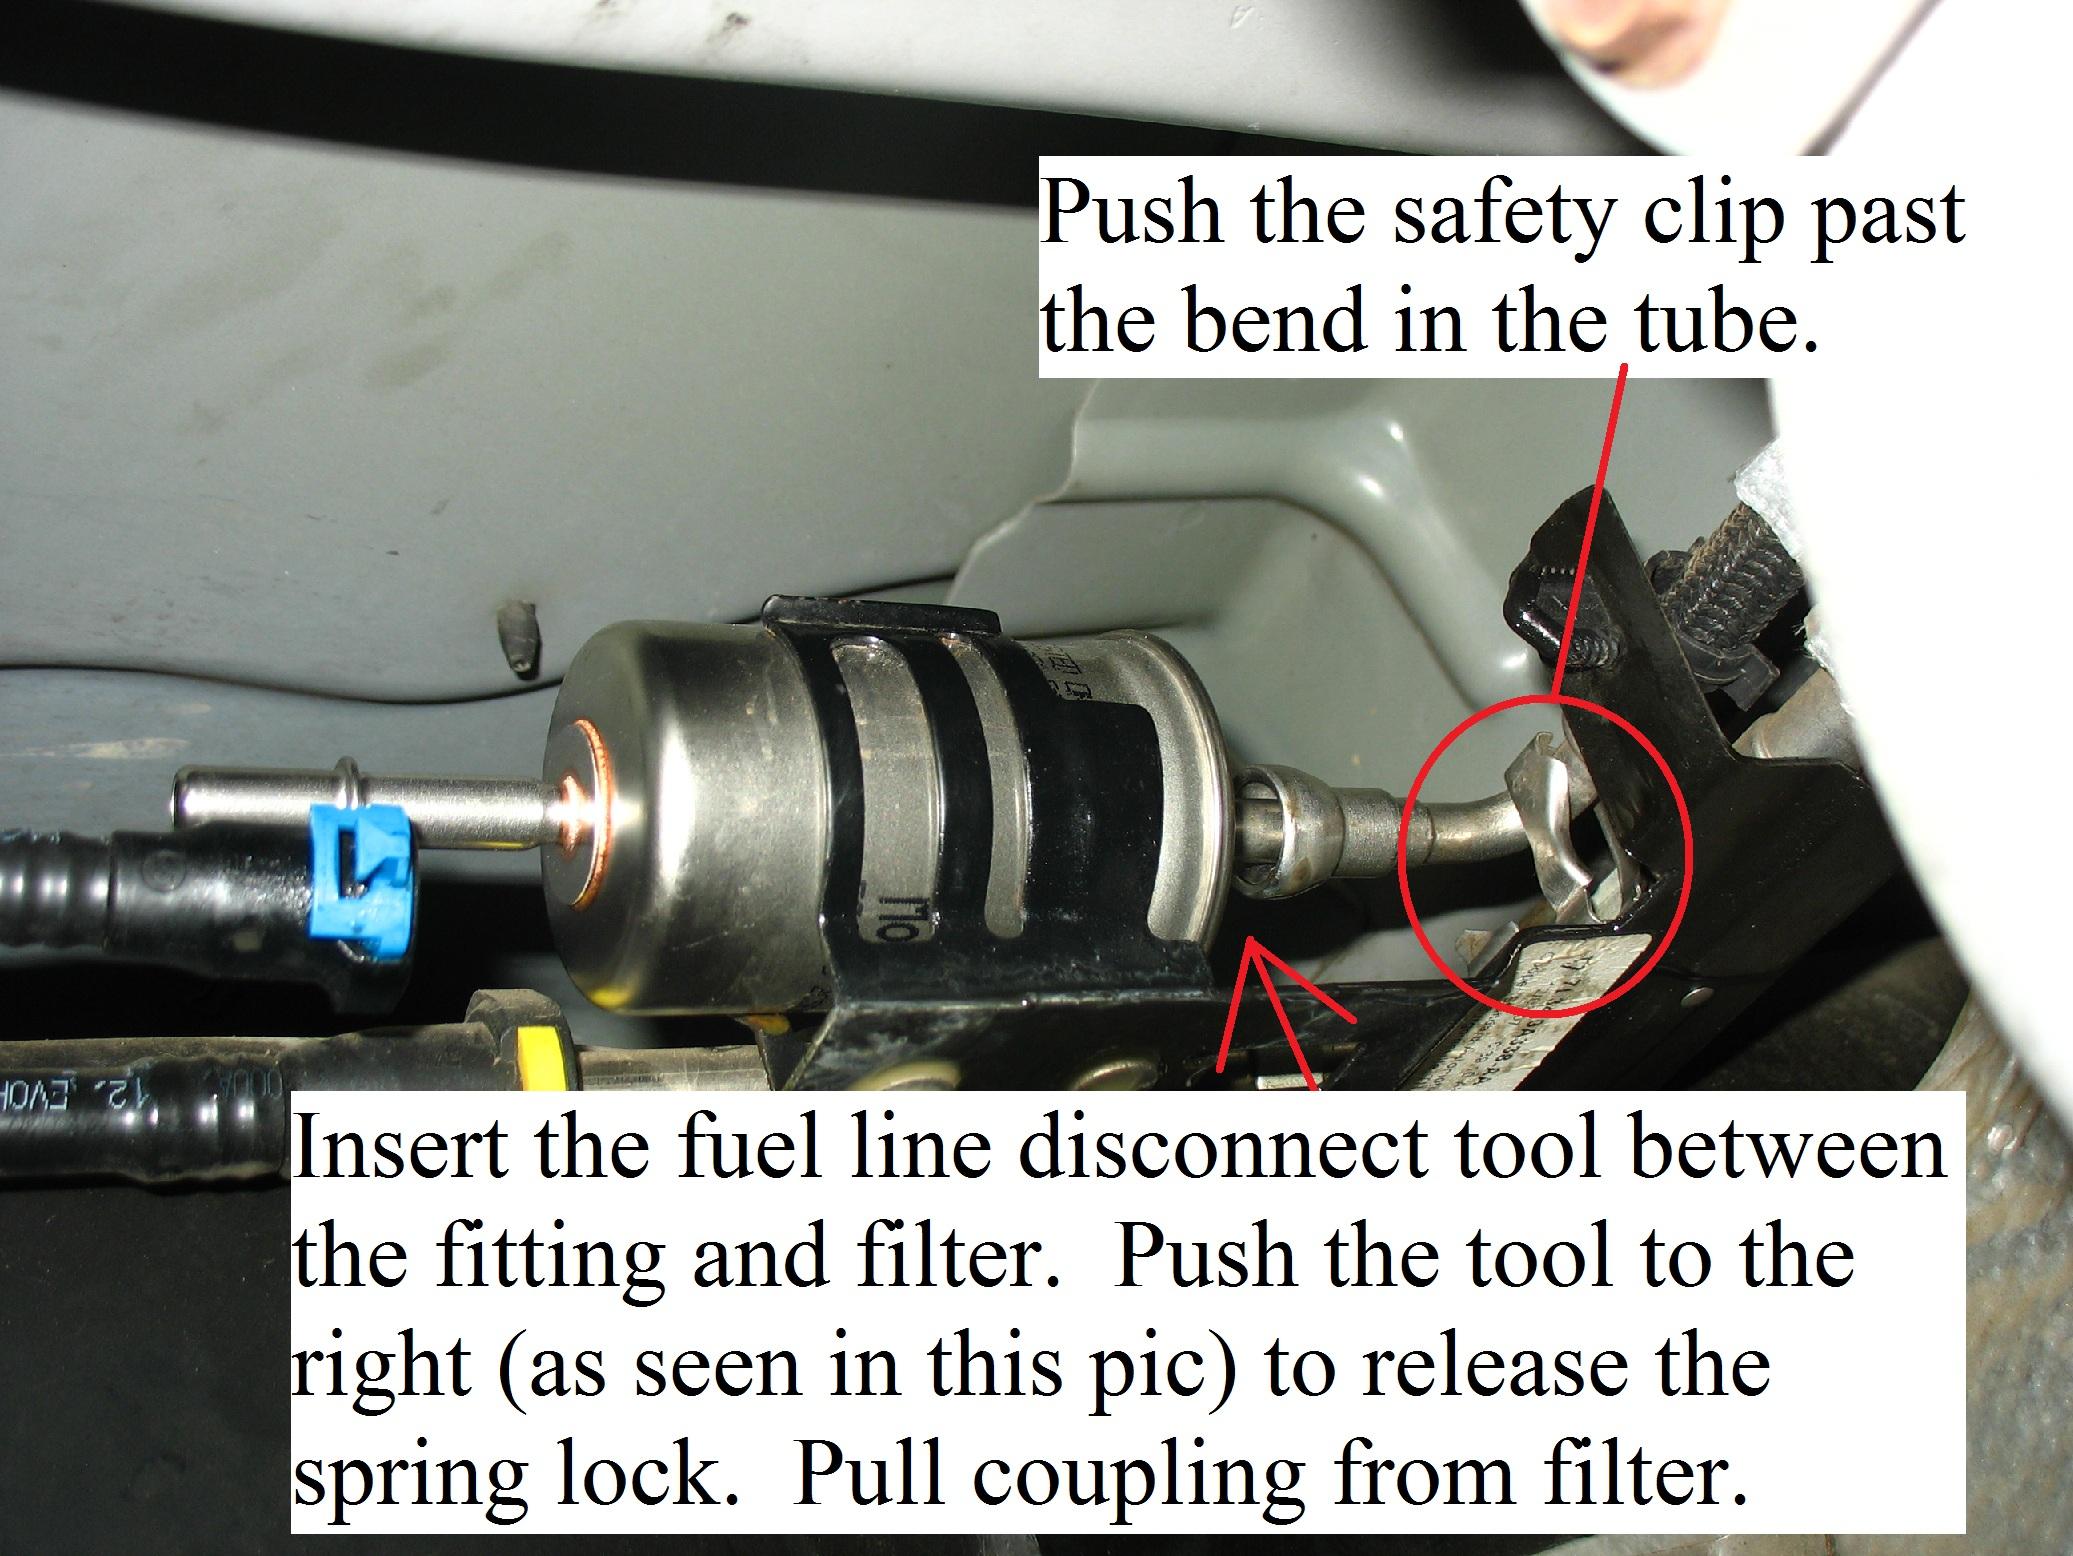 2006 Expedition Fuel Filter - Secure Wiring Diagram visualdraw-bad -  visualdraw-bad.sosanziani.itdiagram database - sosanziani.it